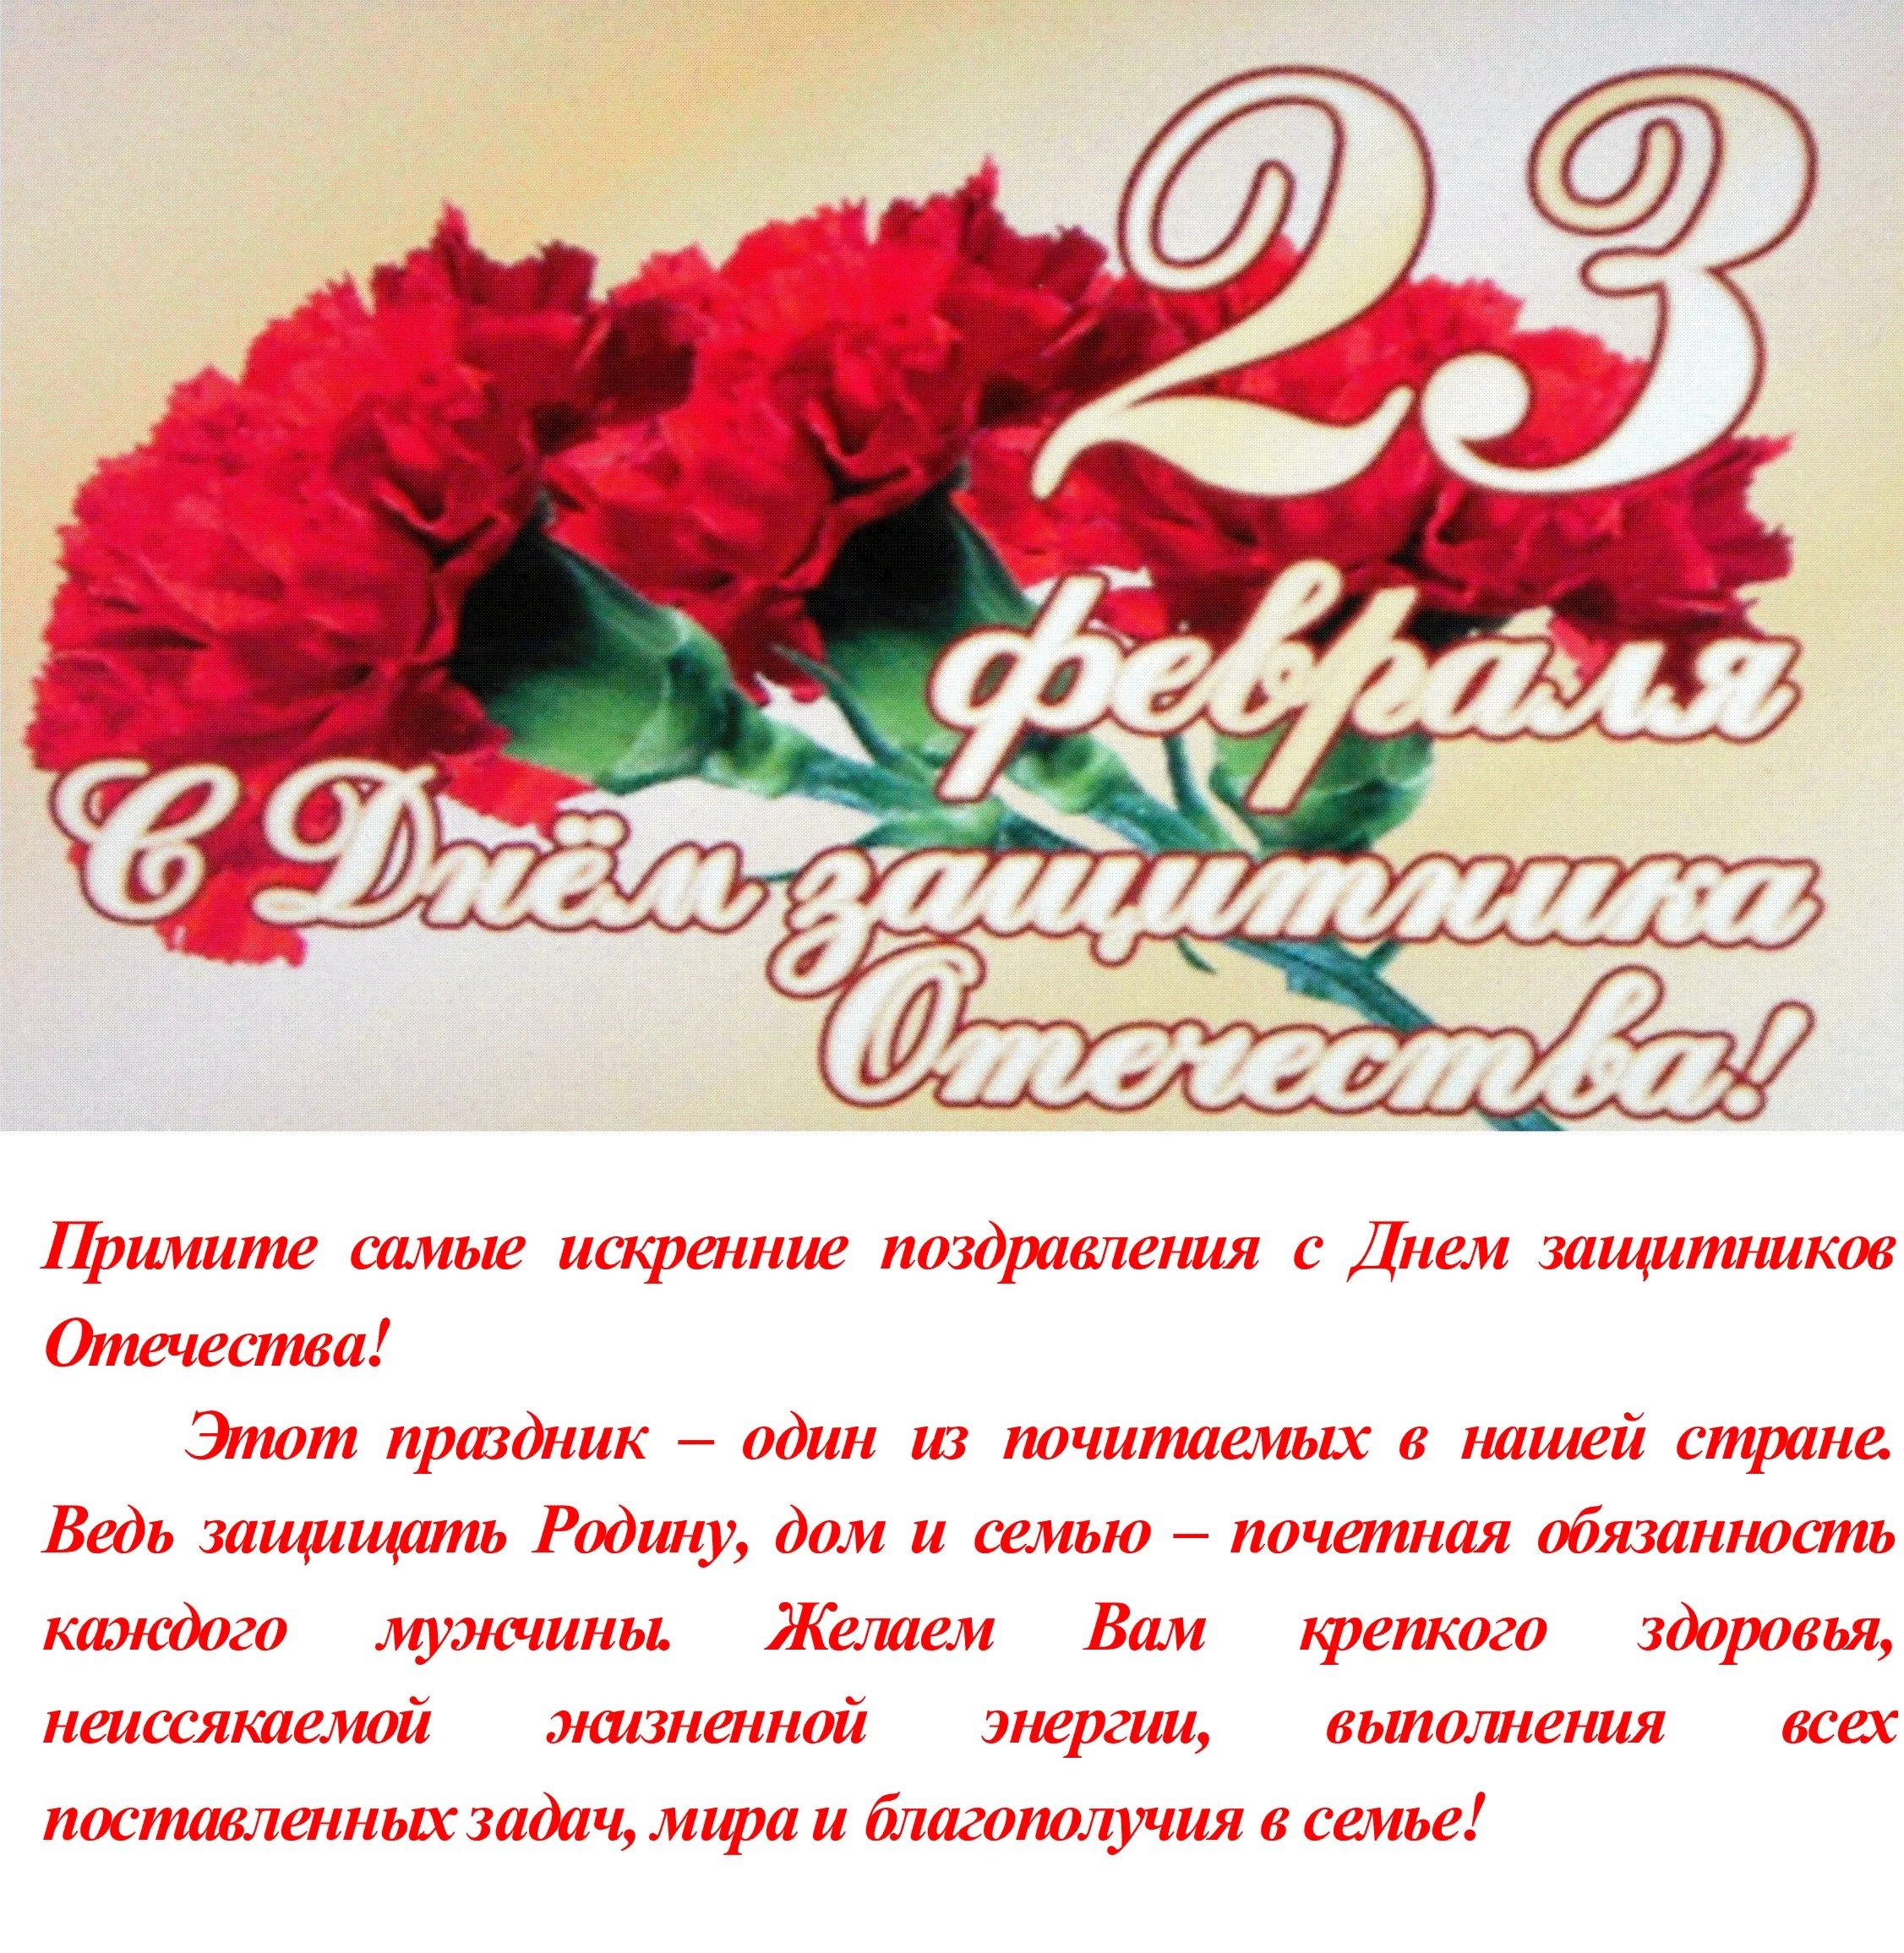 С 23 февраля открытки текст